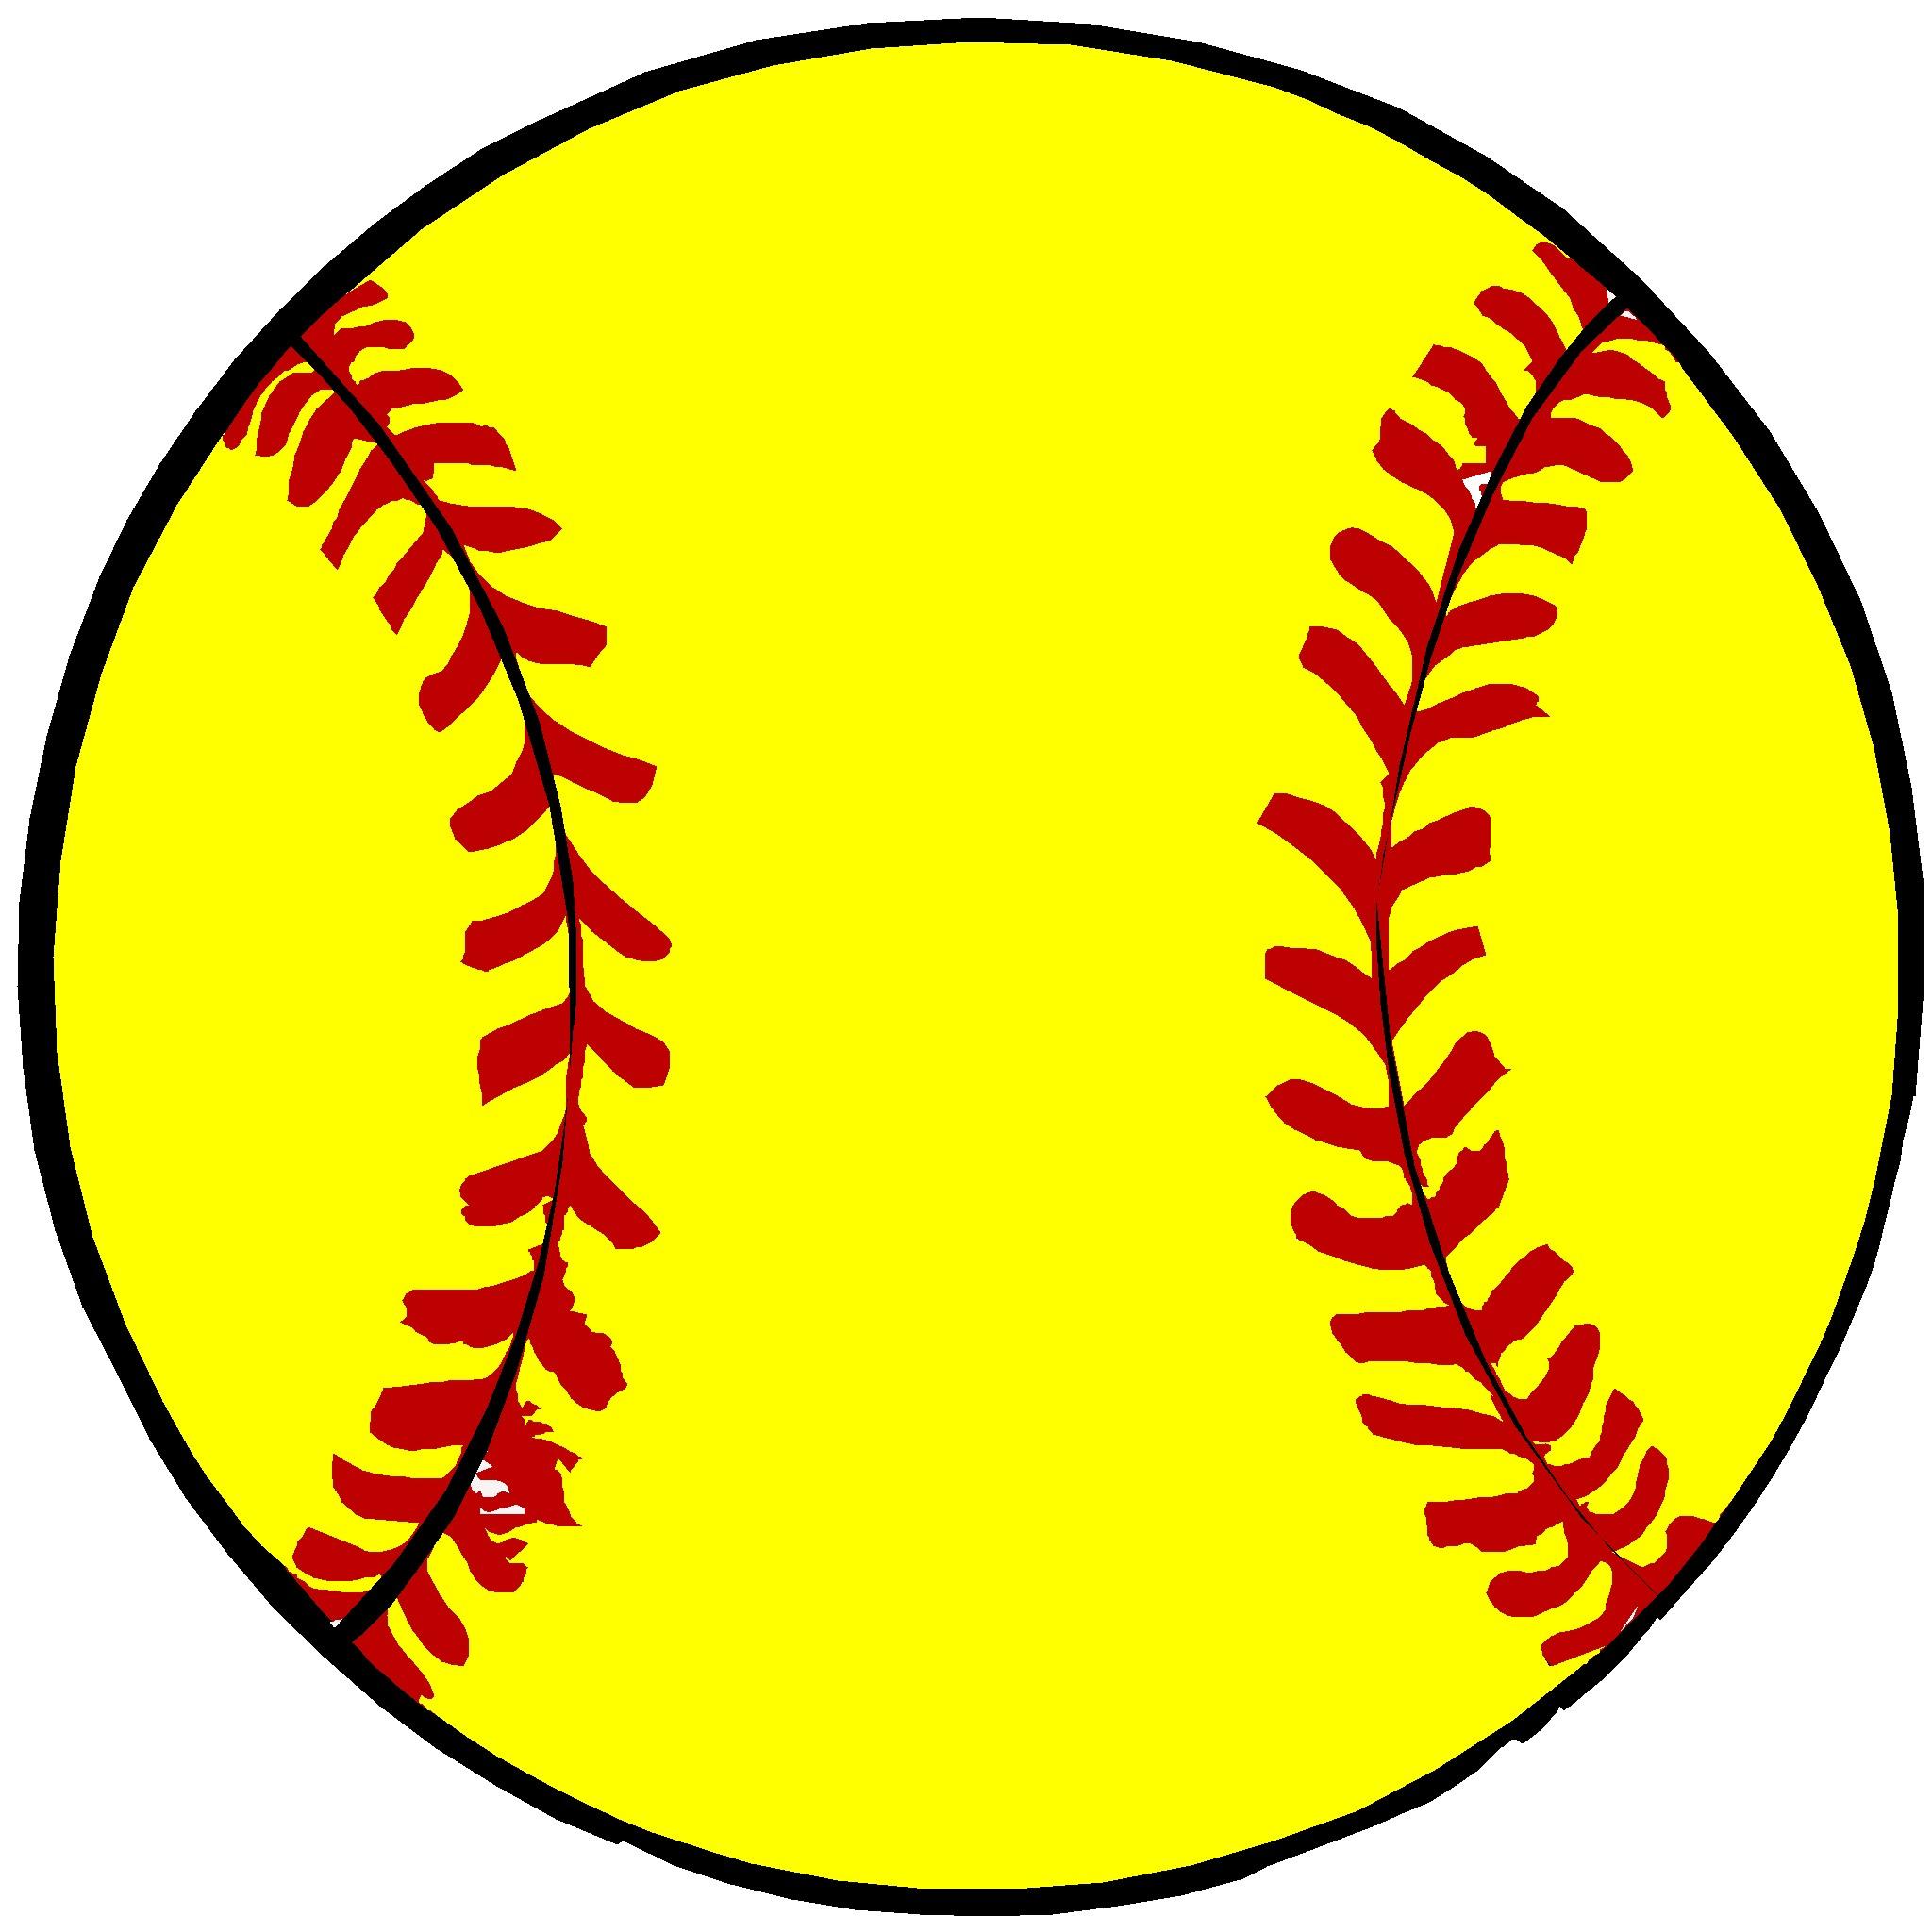 softball ball clipart .. | Clipart Panda - Free Clipart Images